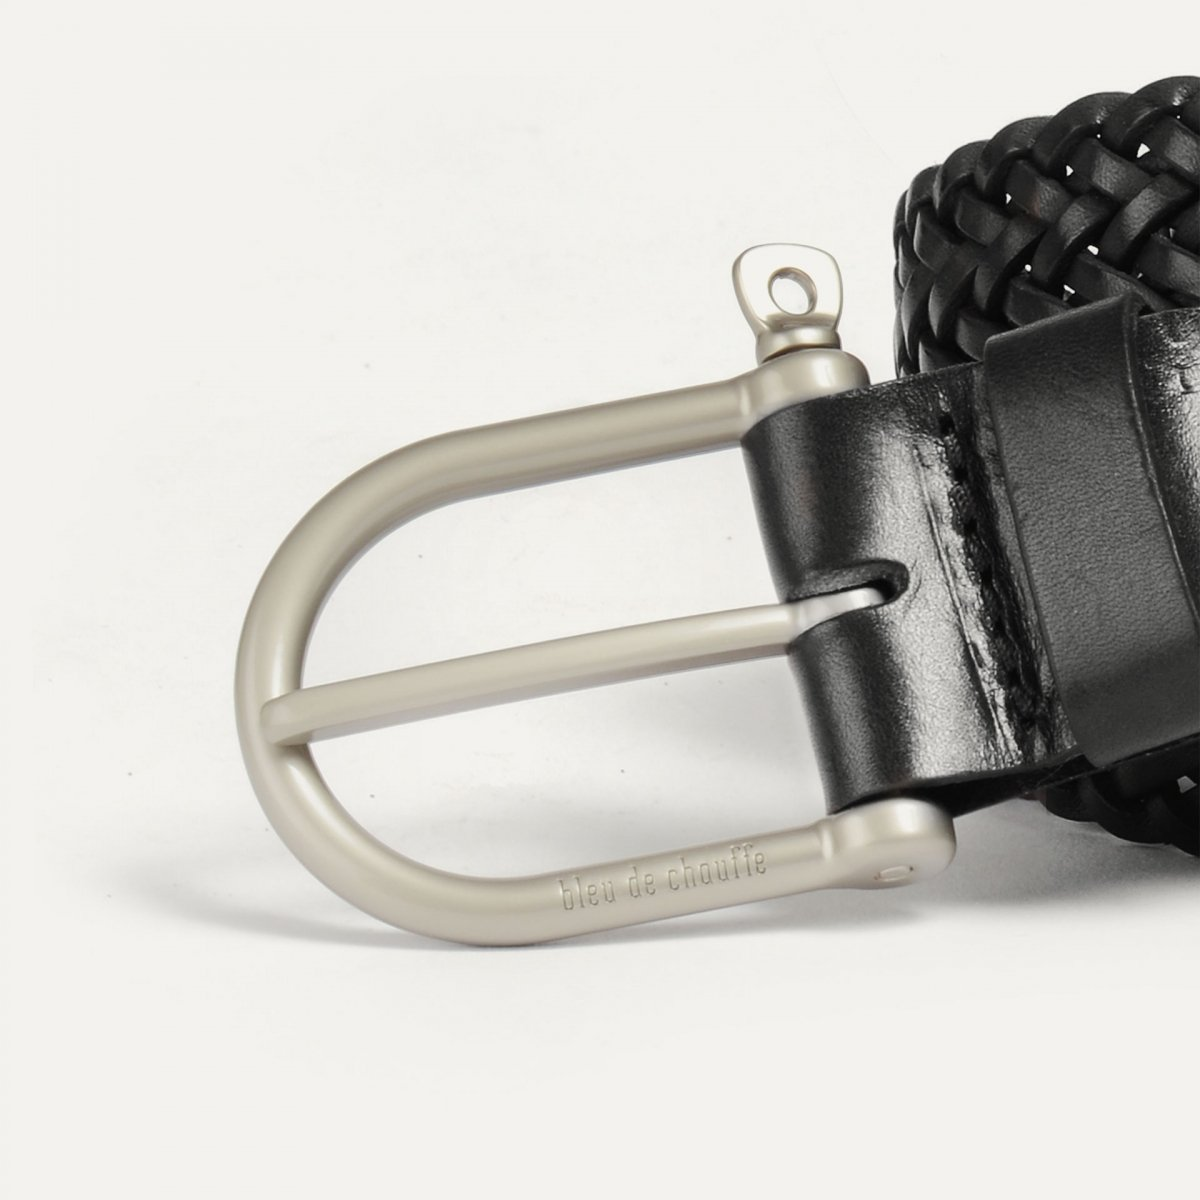 Manille Belt / braided leather - Black (image n°2)